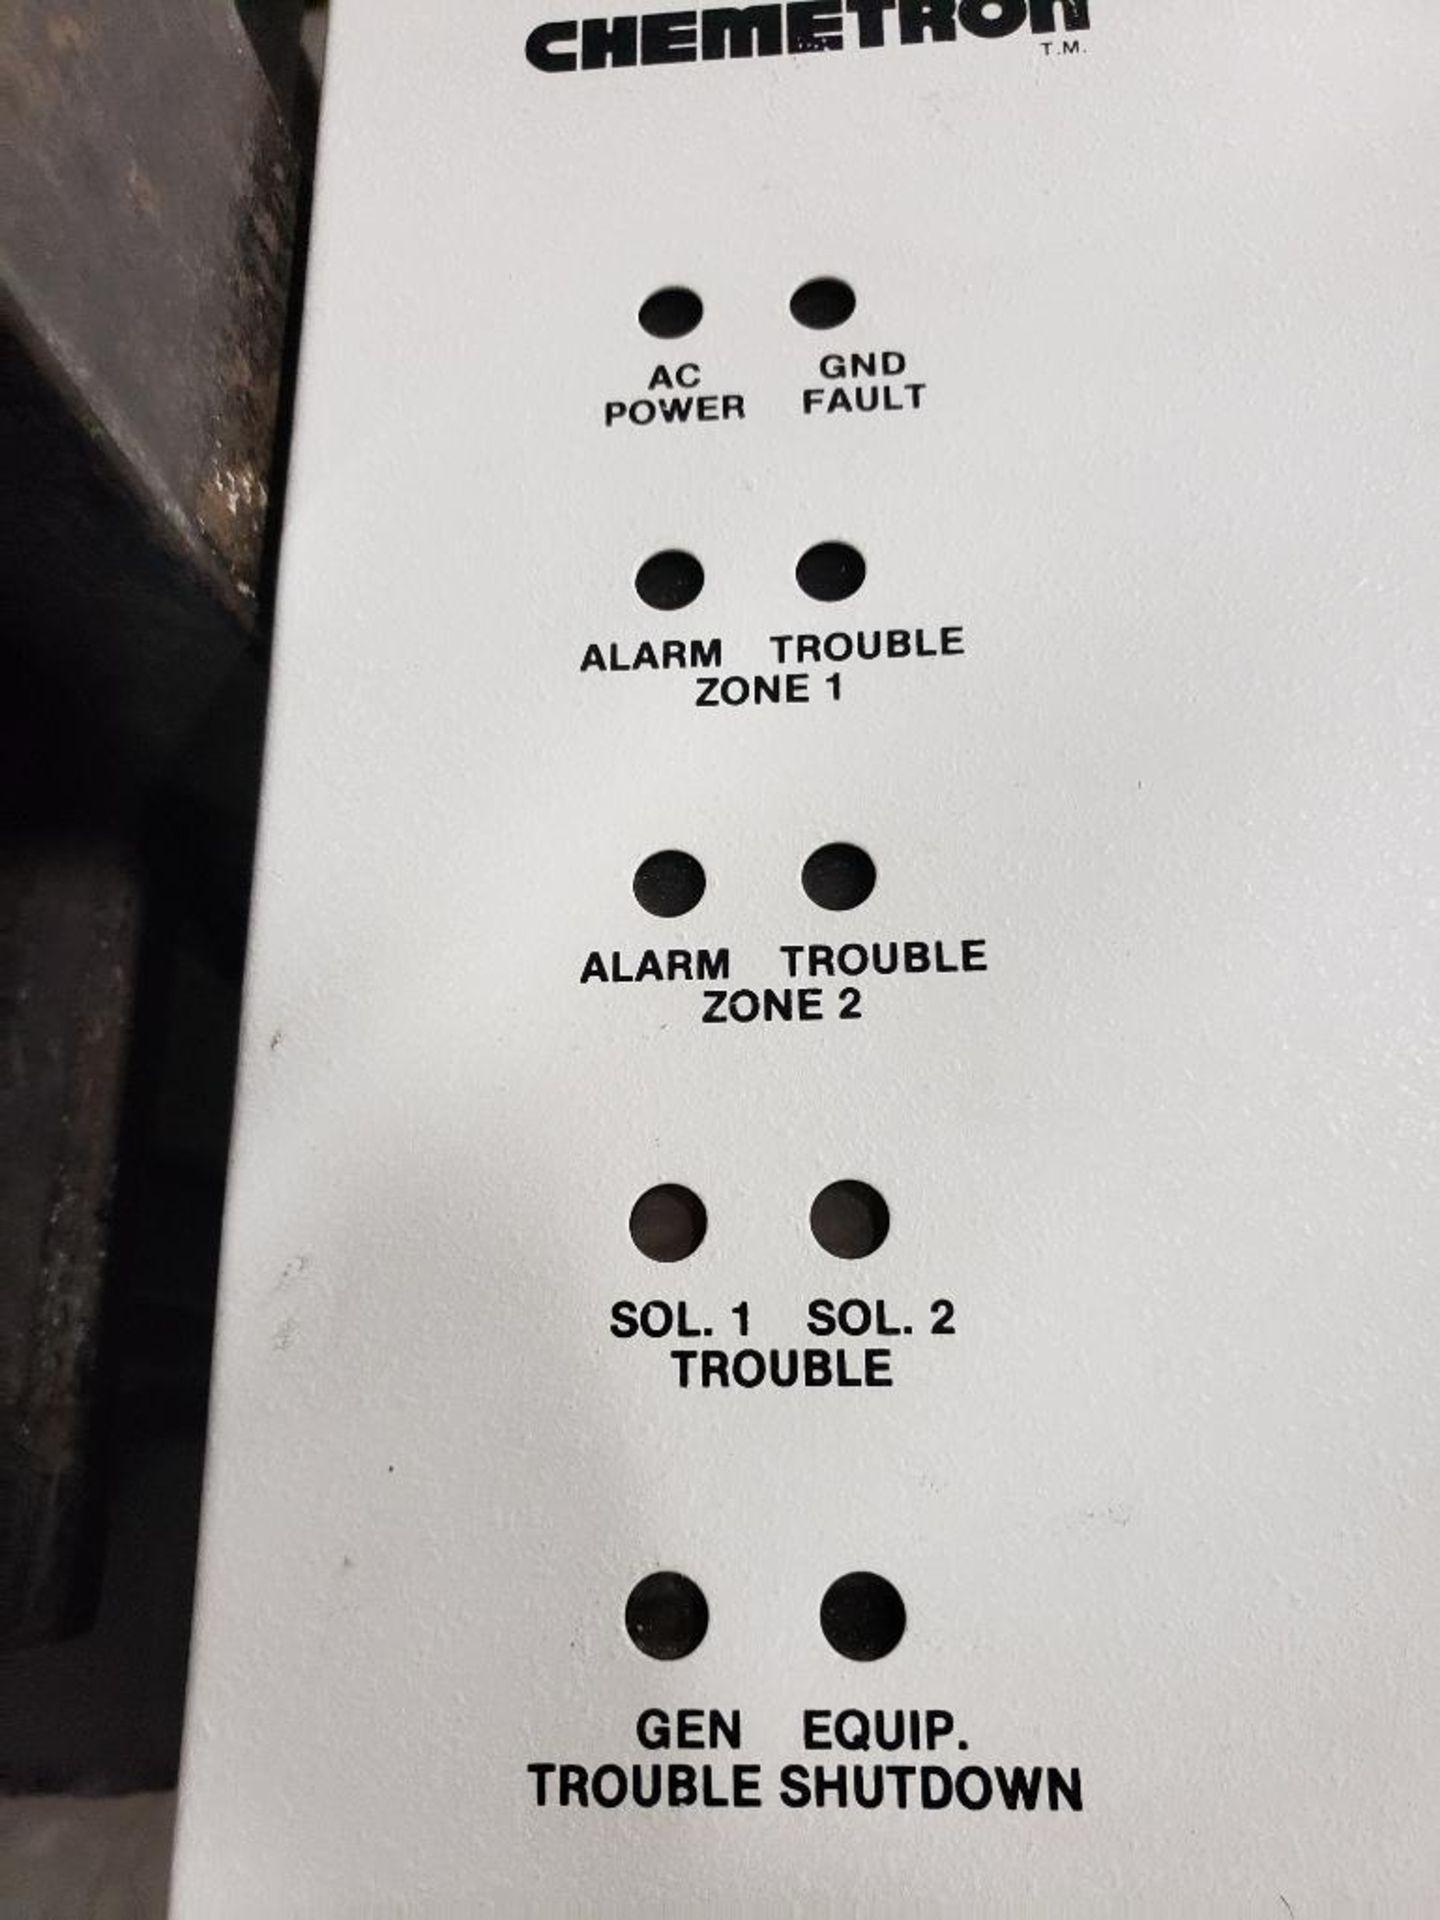 Chemetron Fire System control unit 1-010-0521-3. - Image 3 of 14